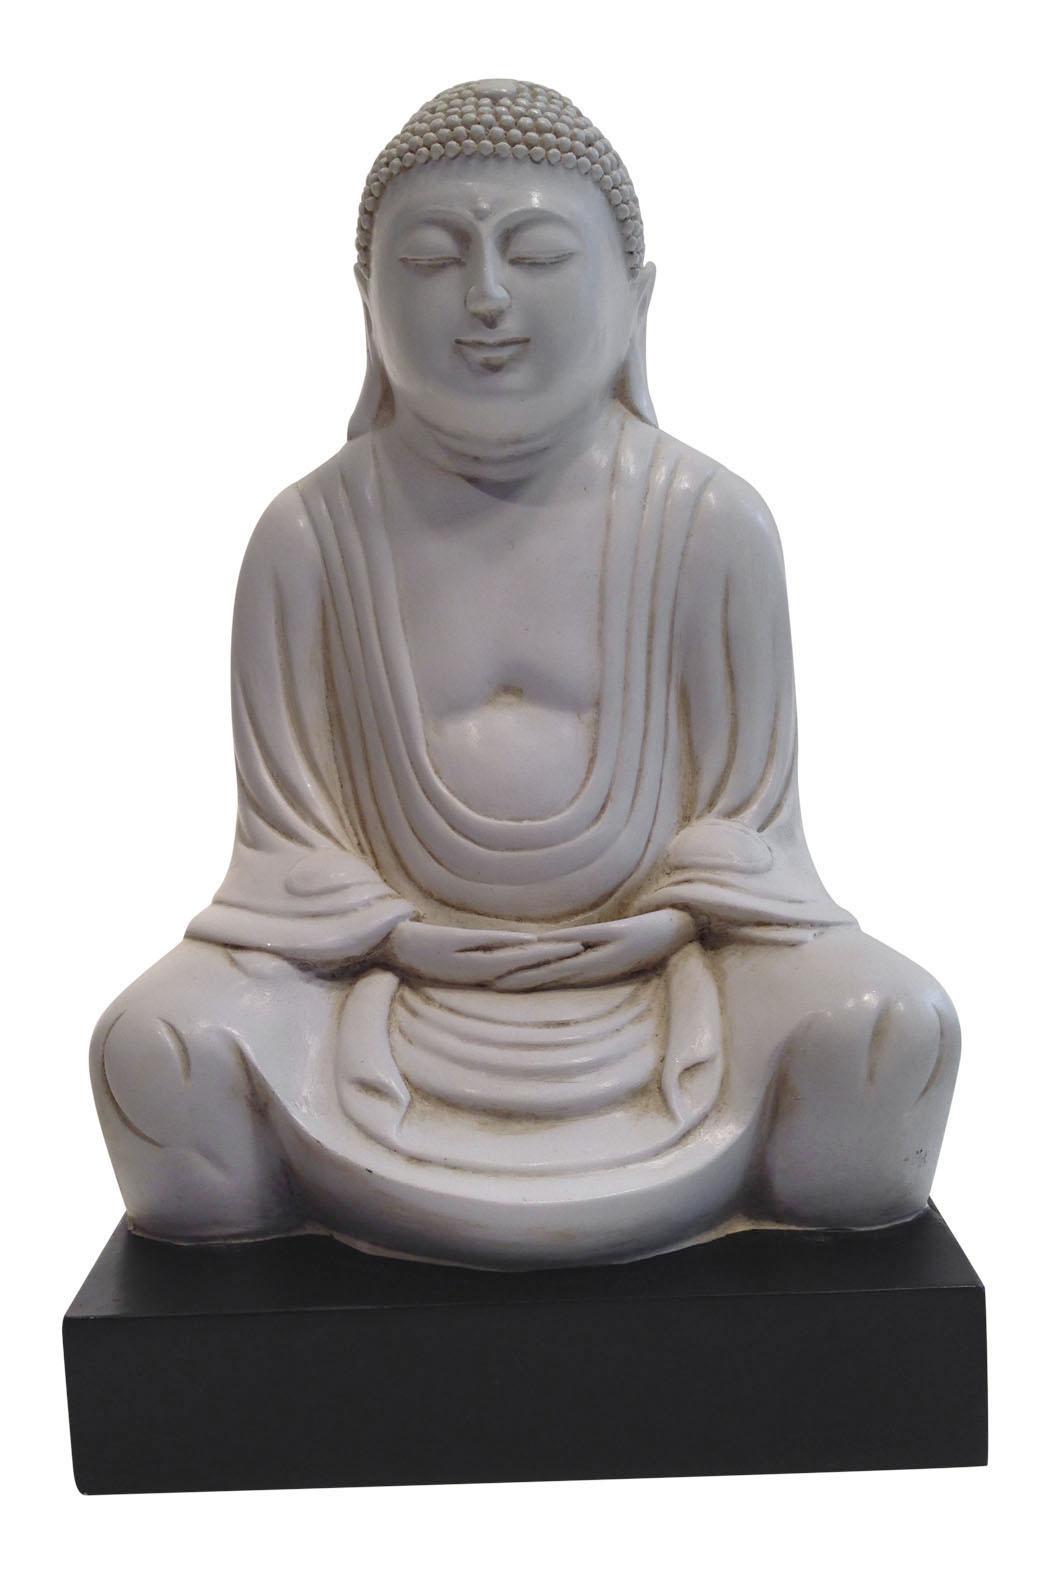 GH3 RESIN BUDDHA 3921